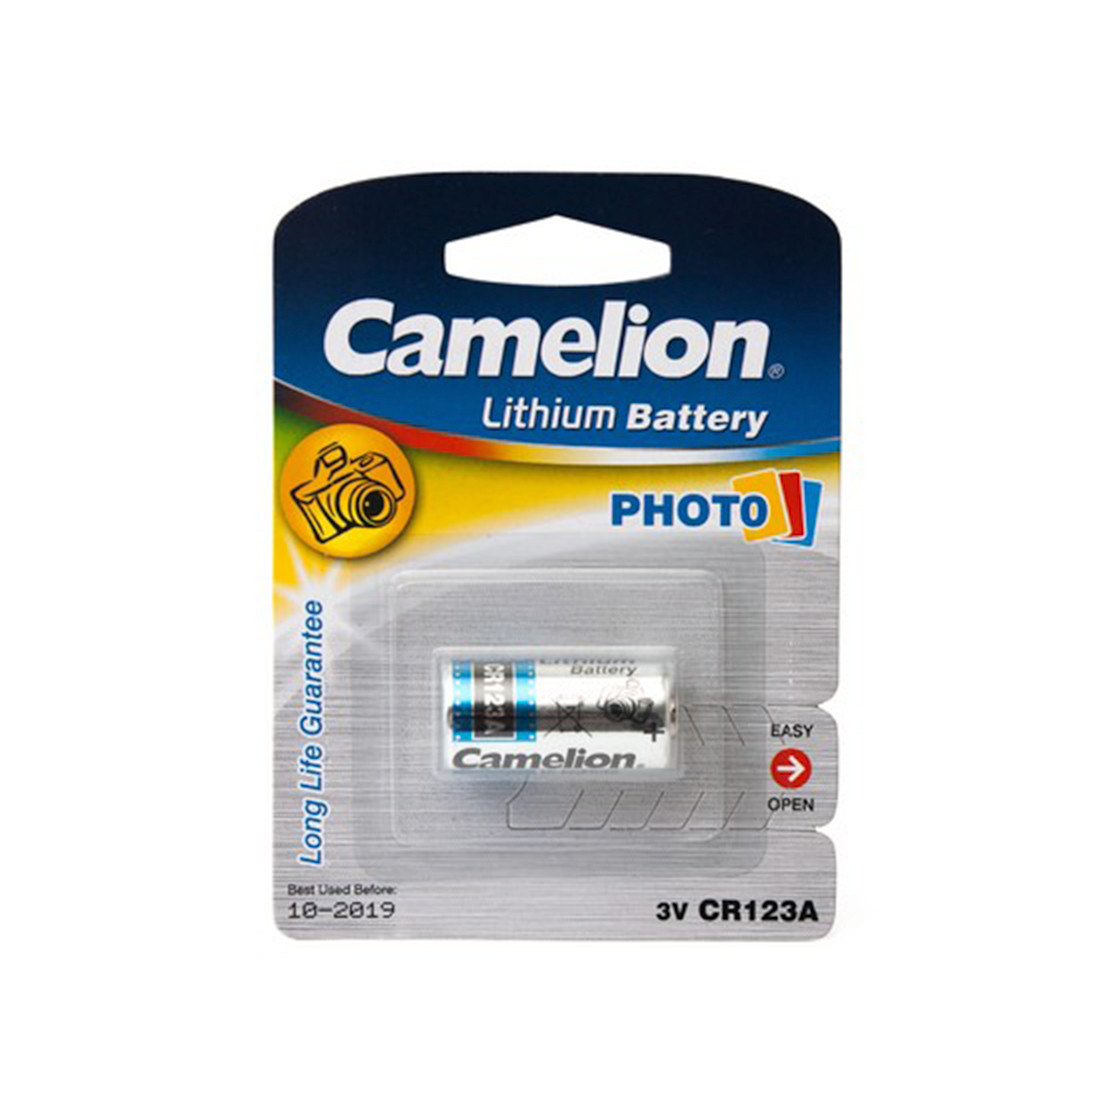 Батарейка, CAMELION, CR123A-BP1, 3V, 1300 mAh, Lithium, 1 шт., Серебристый